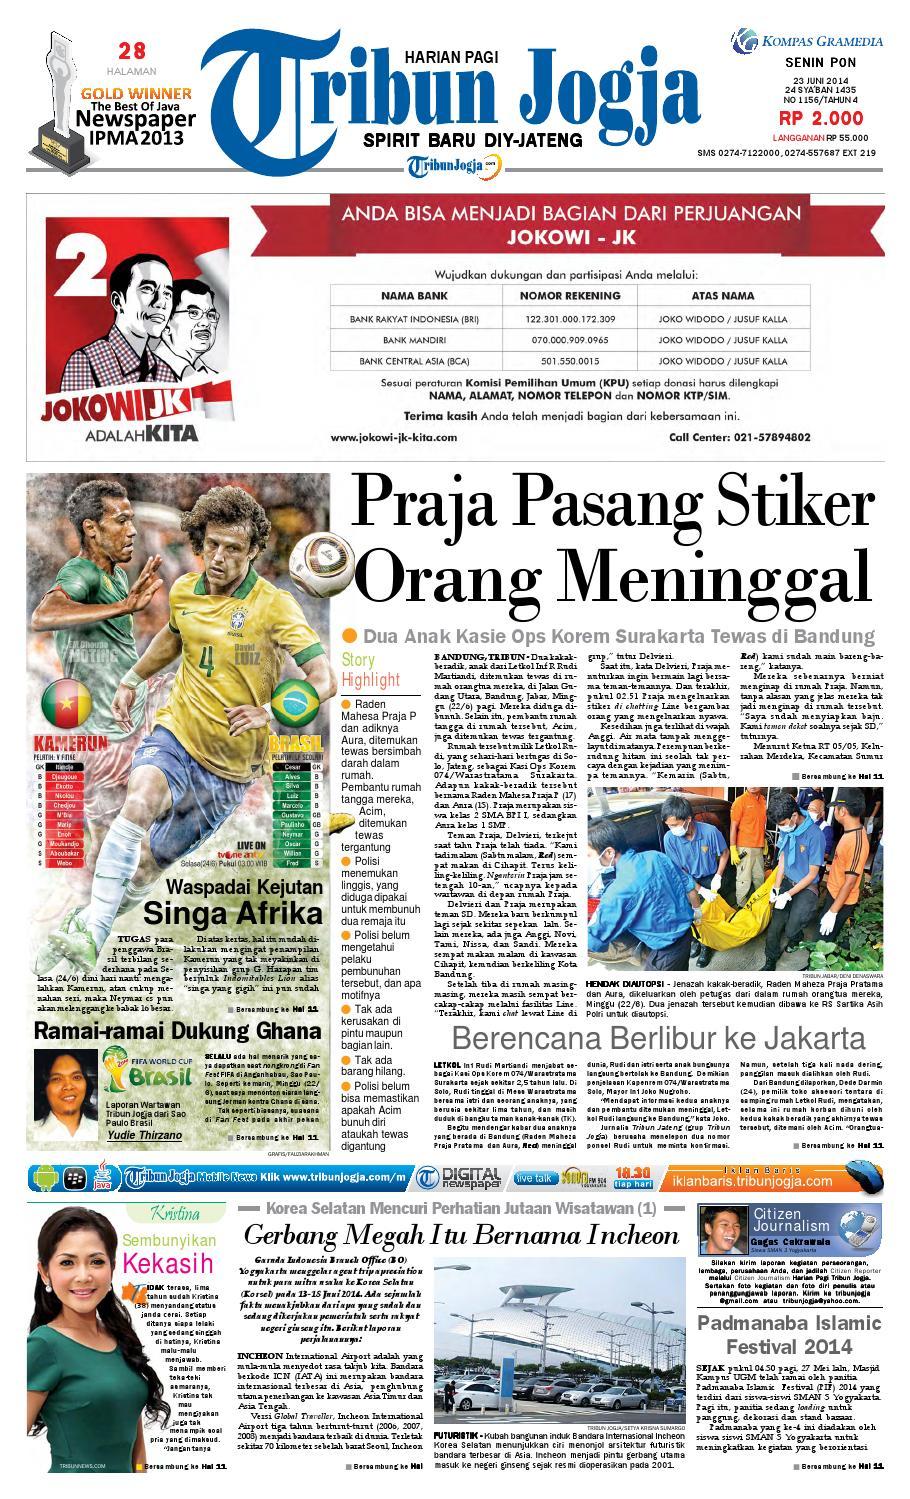 Tribunjogja 23 06 2014 By Tribun Jogja Issuu Produk Ukm Bumn Wisata Mewah Bali 3hr 2mlm